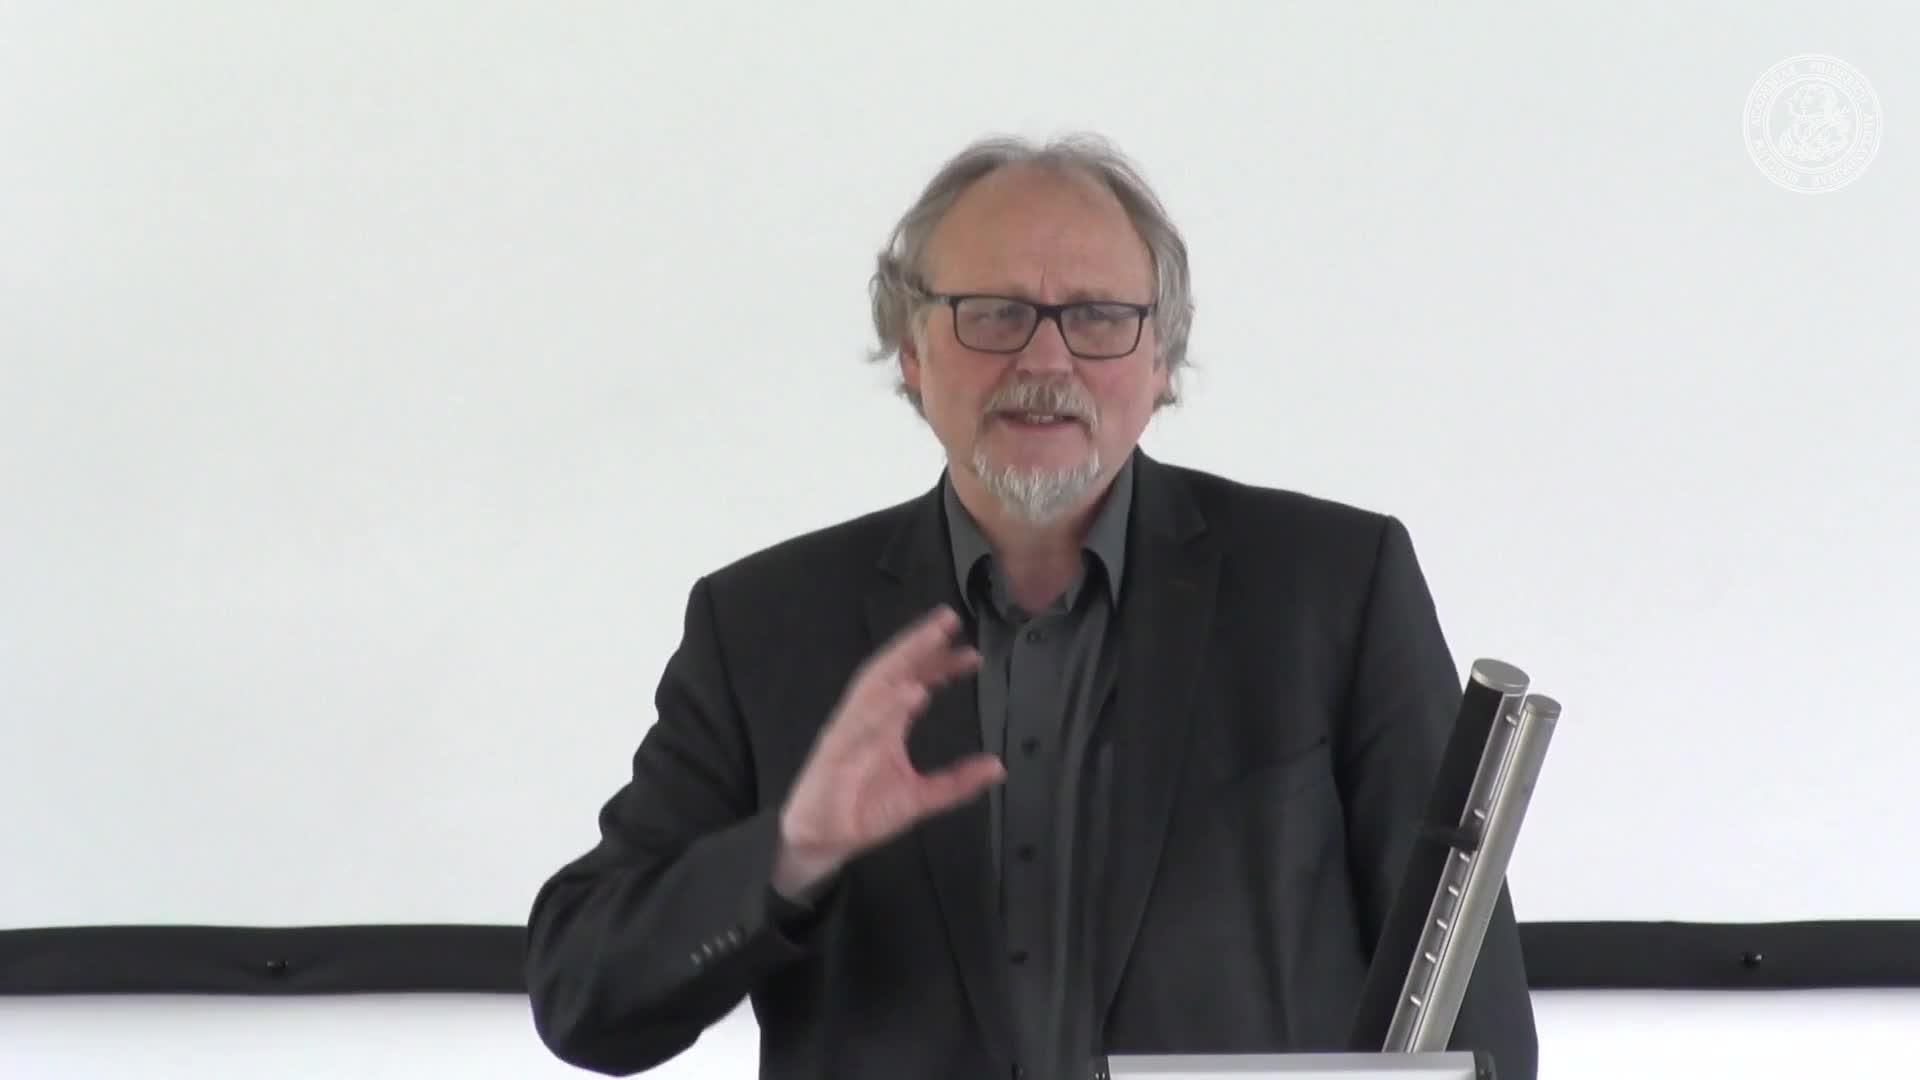 Politische Theorie II Marx Teil 2 preview image